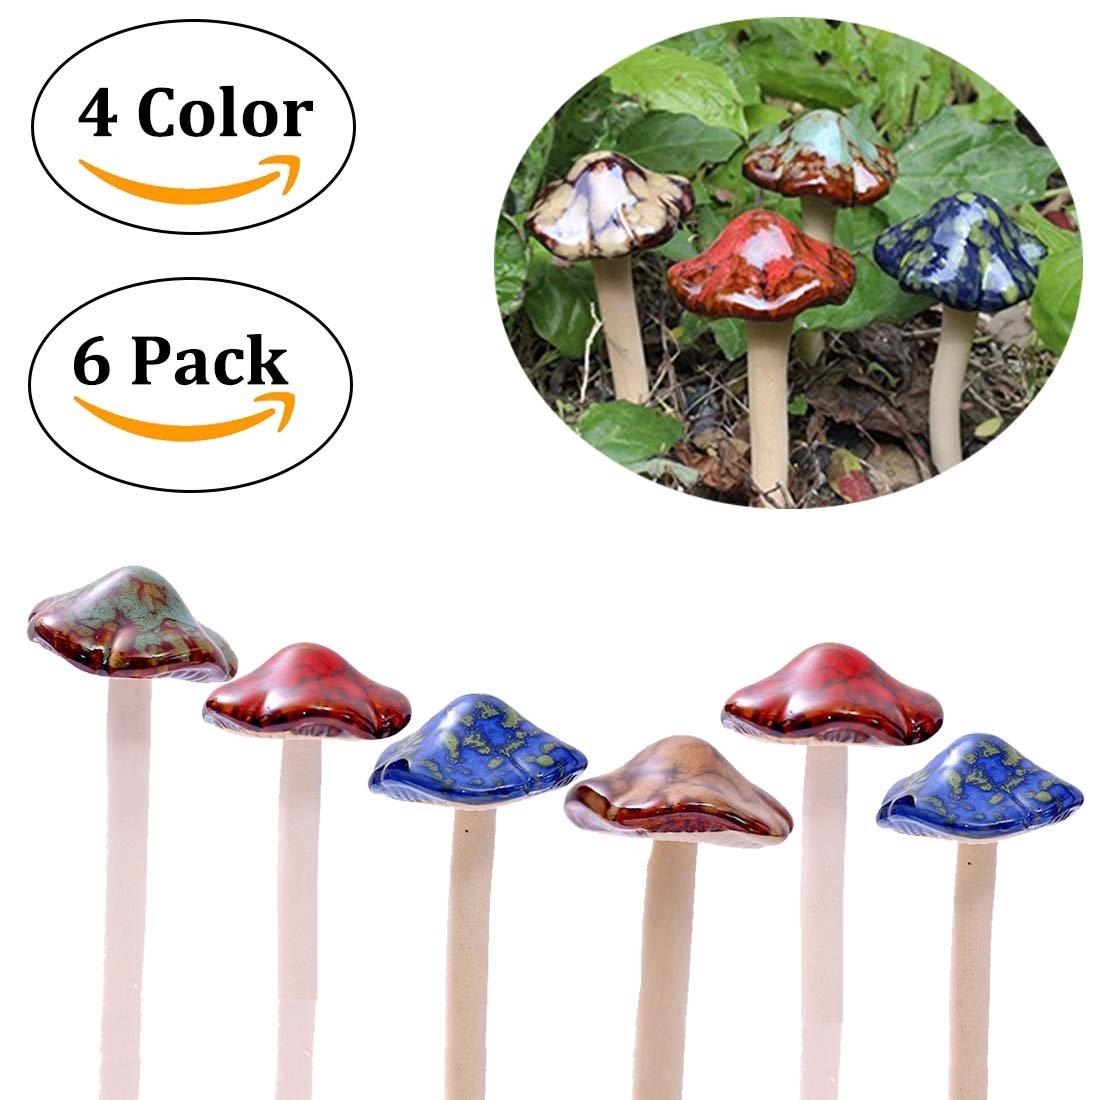 Aigel Ceramic Mushrooms Figurine Garden Decor,Garden Decorative Stakes,Lawn Mushrooms Decor, Garden Pots Decoration Pottery Ornament for Fairy Garden Flowerpot Outdoor Statue [ 4-Colour 6-Pieces ]